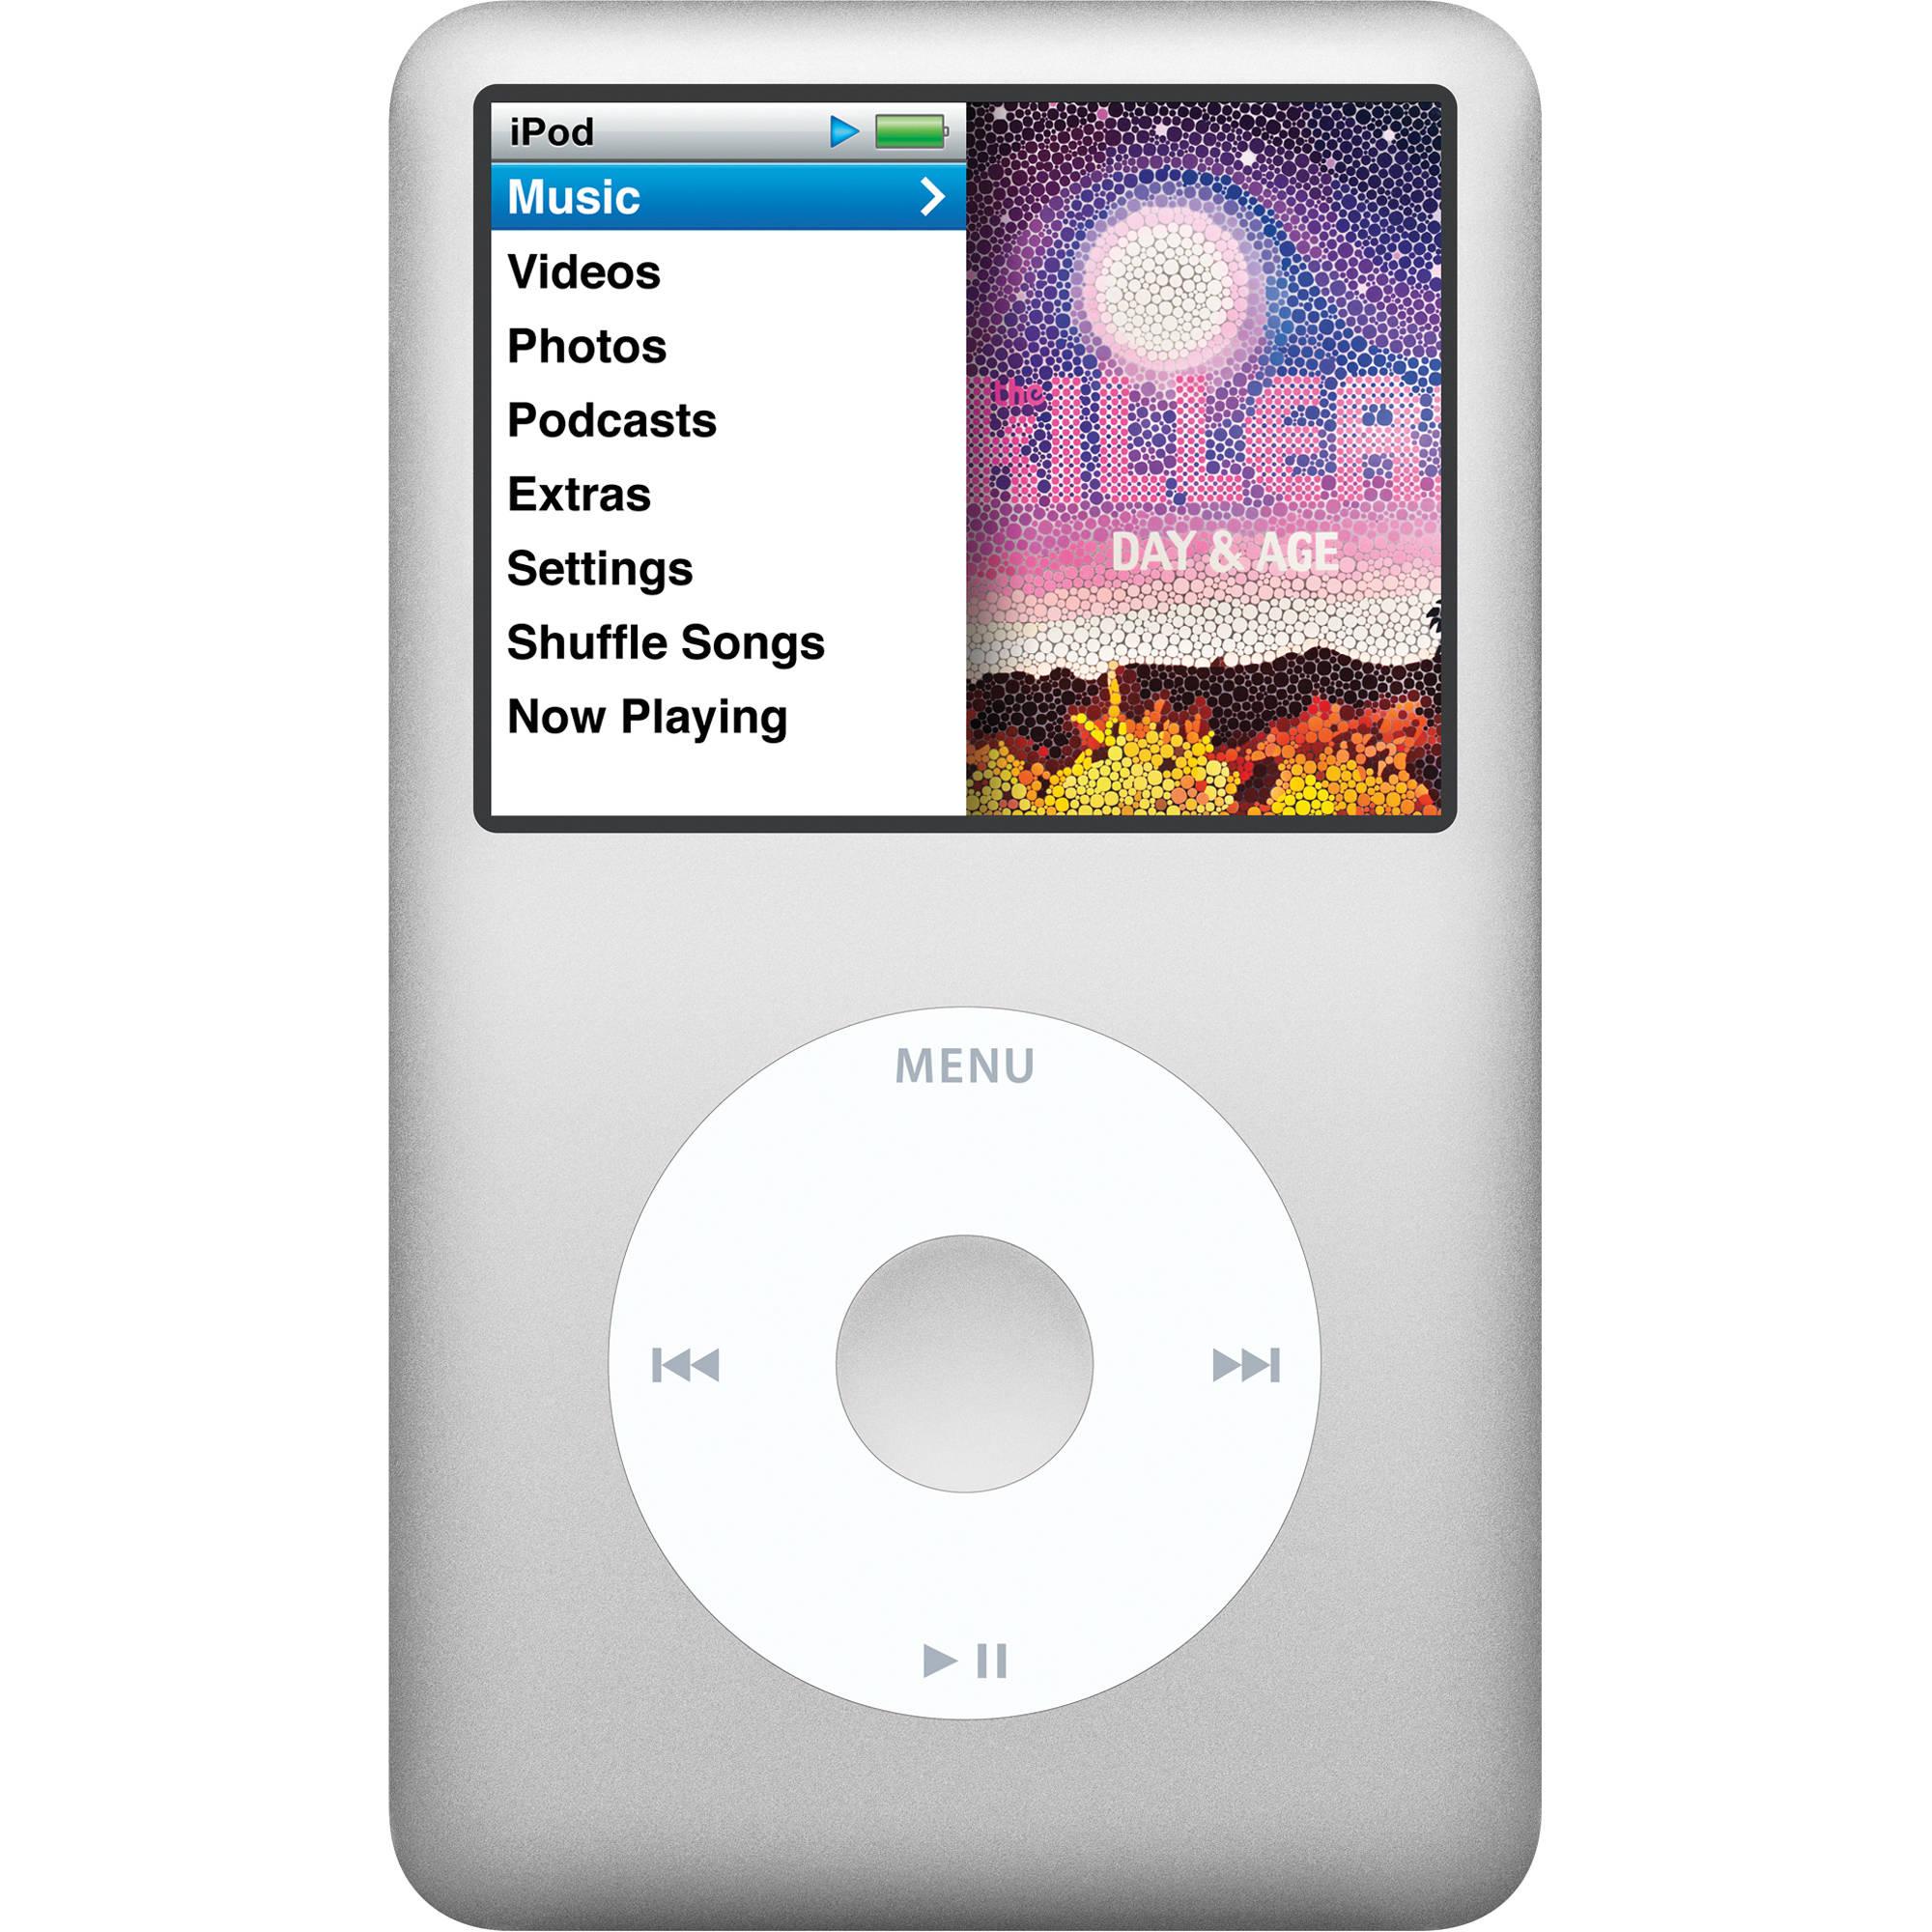 Apple 160gb ipod classic silver 7th generation mc293ll a b h